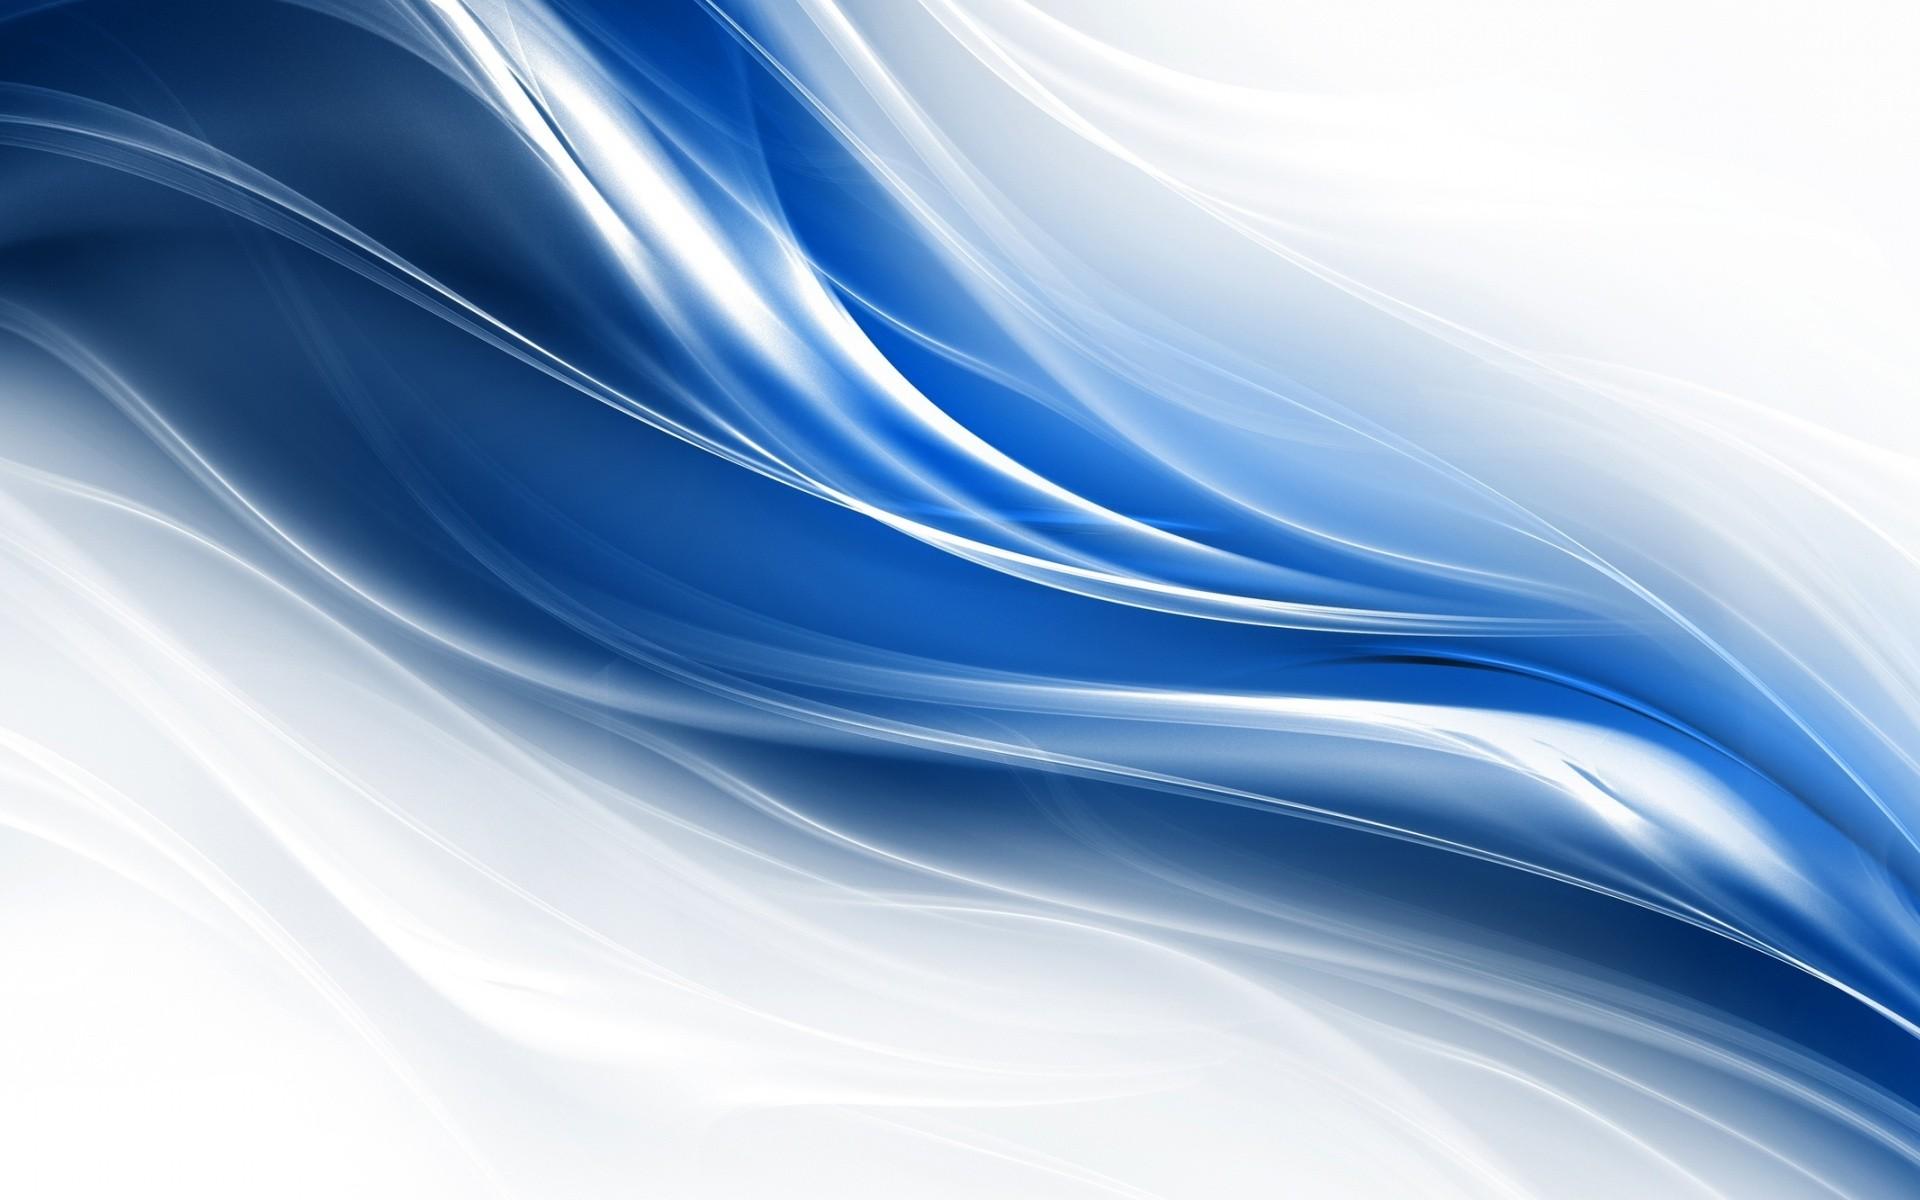 Flow HD wallpapers, Desktop wallpaper - most viewed